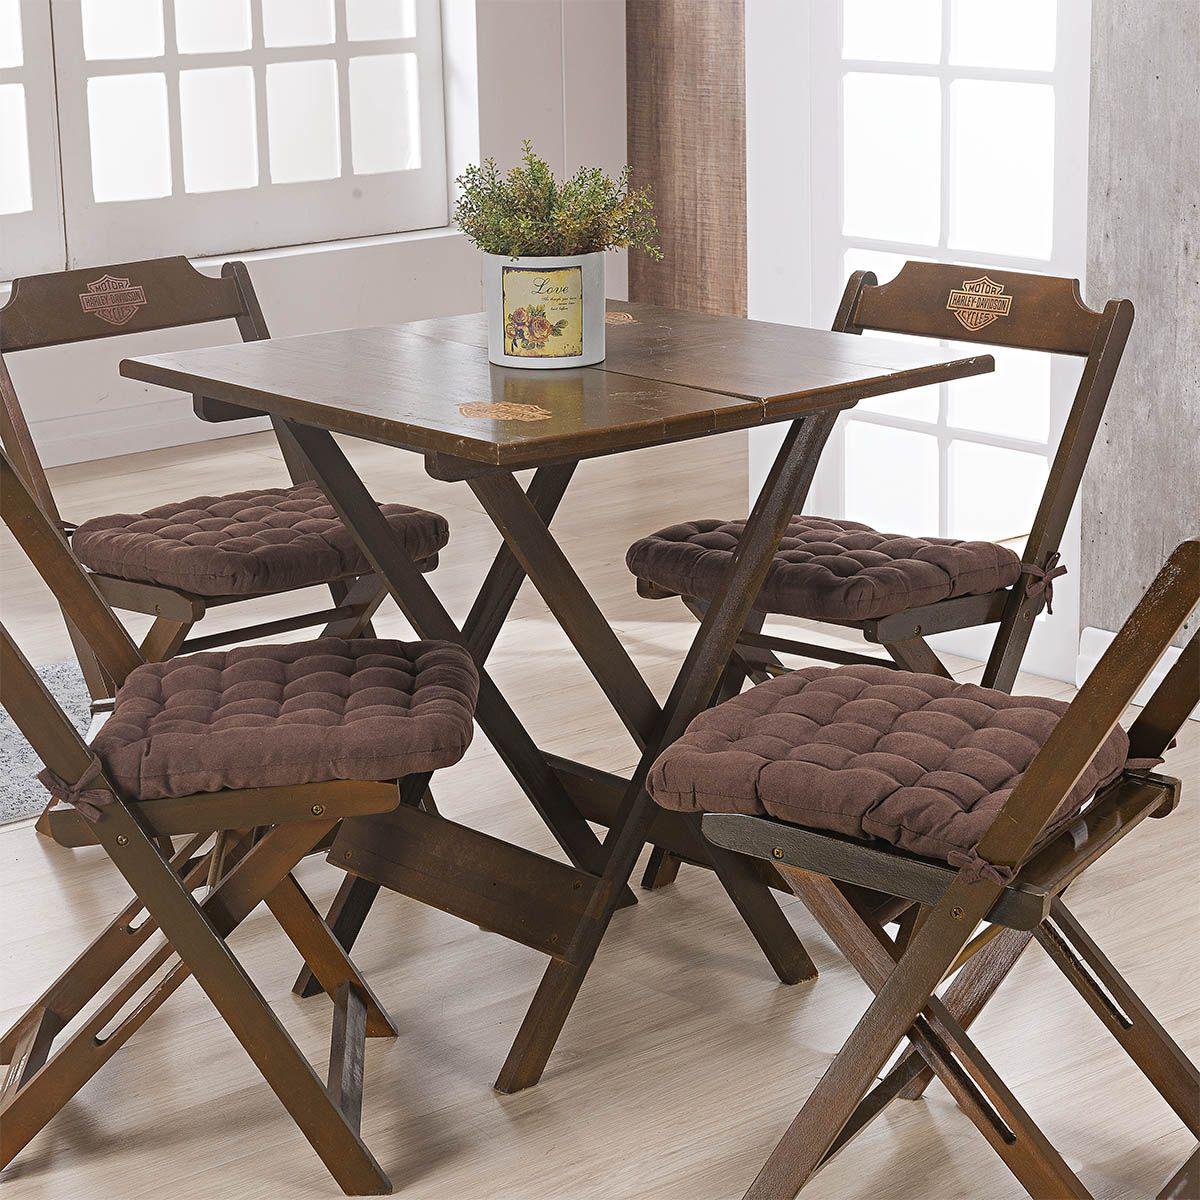 Kit C/ 4 - Assentos P/ Cadeira - Futton - Kalamar - 40cm x 40cm - Chocolate - Niazitex